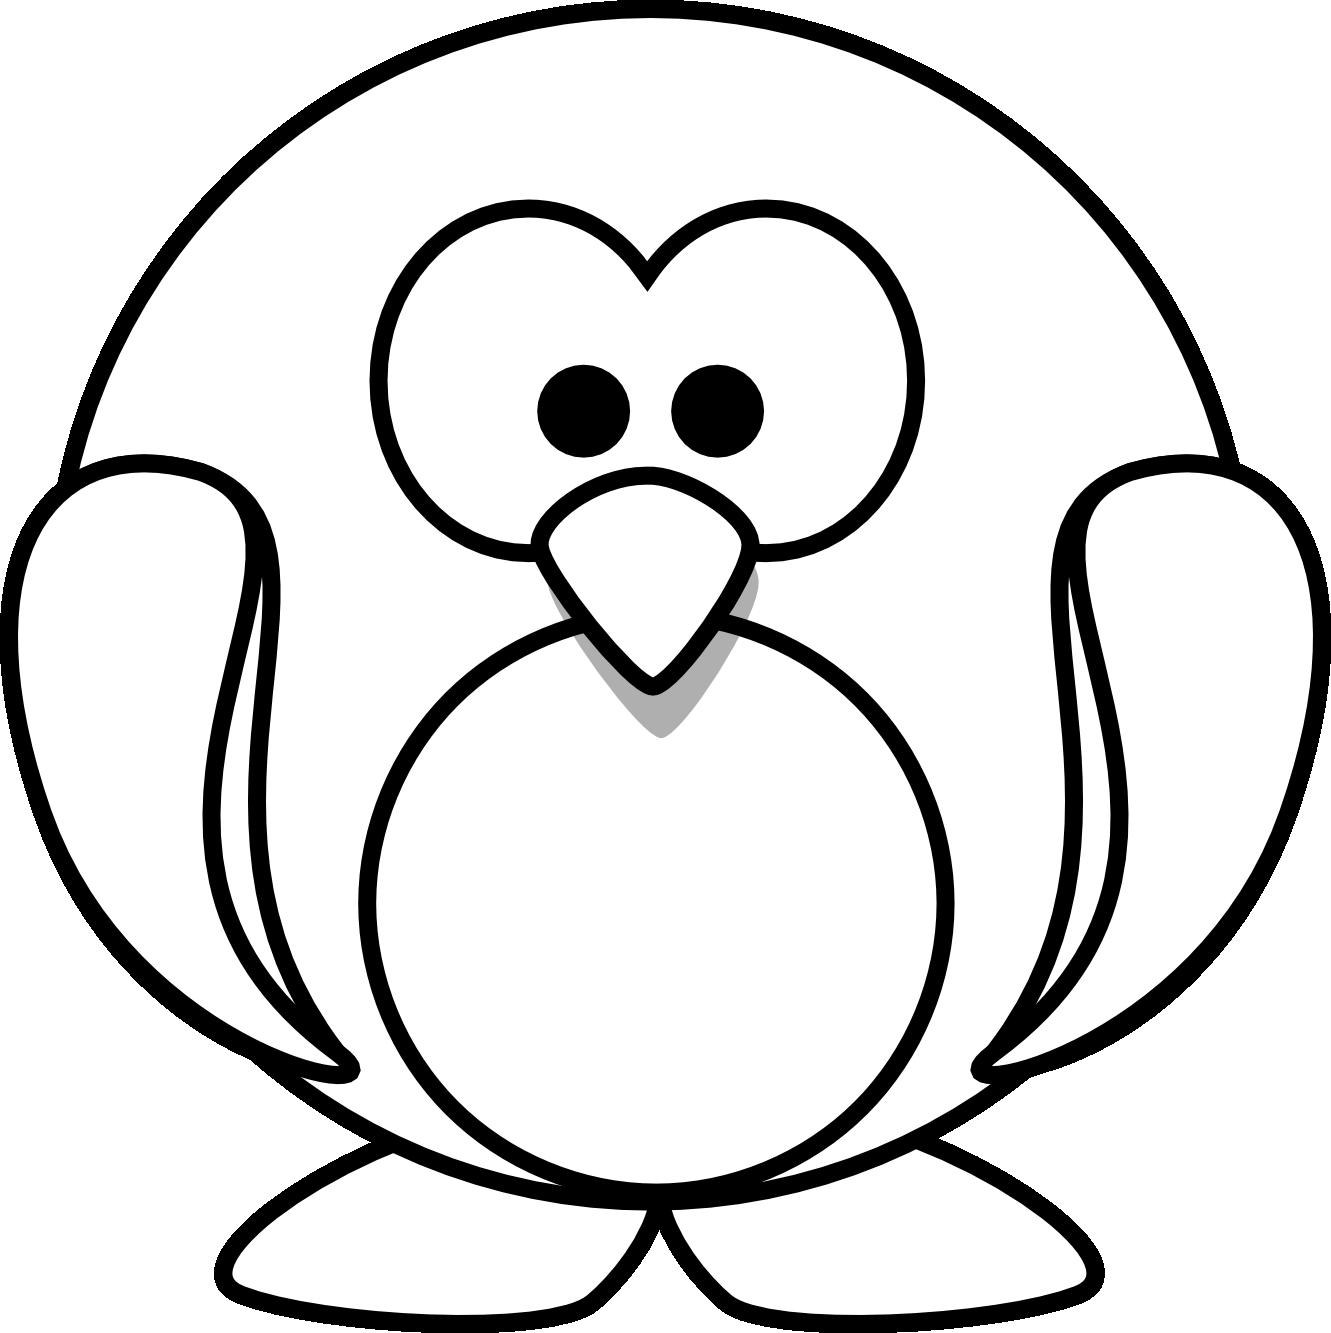 1331x1333 Christmas Penguin Clipart Black And White Clipart Panda